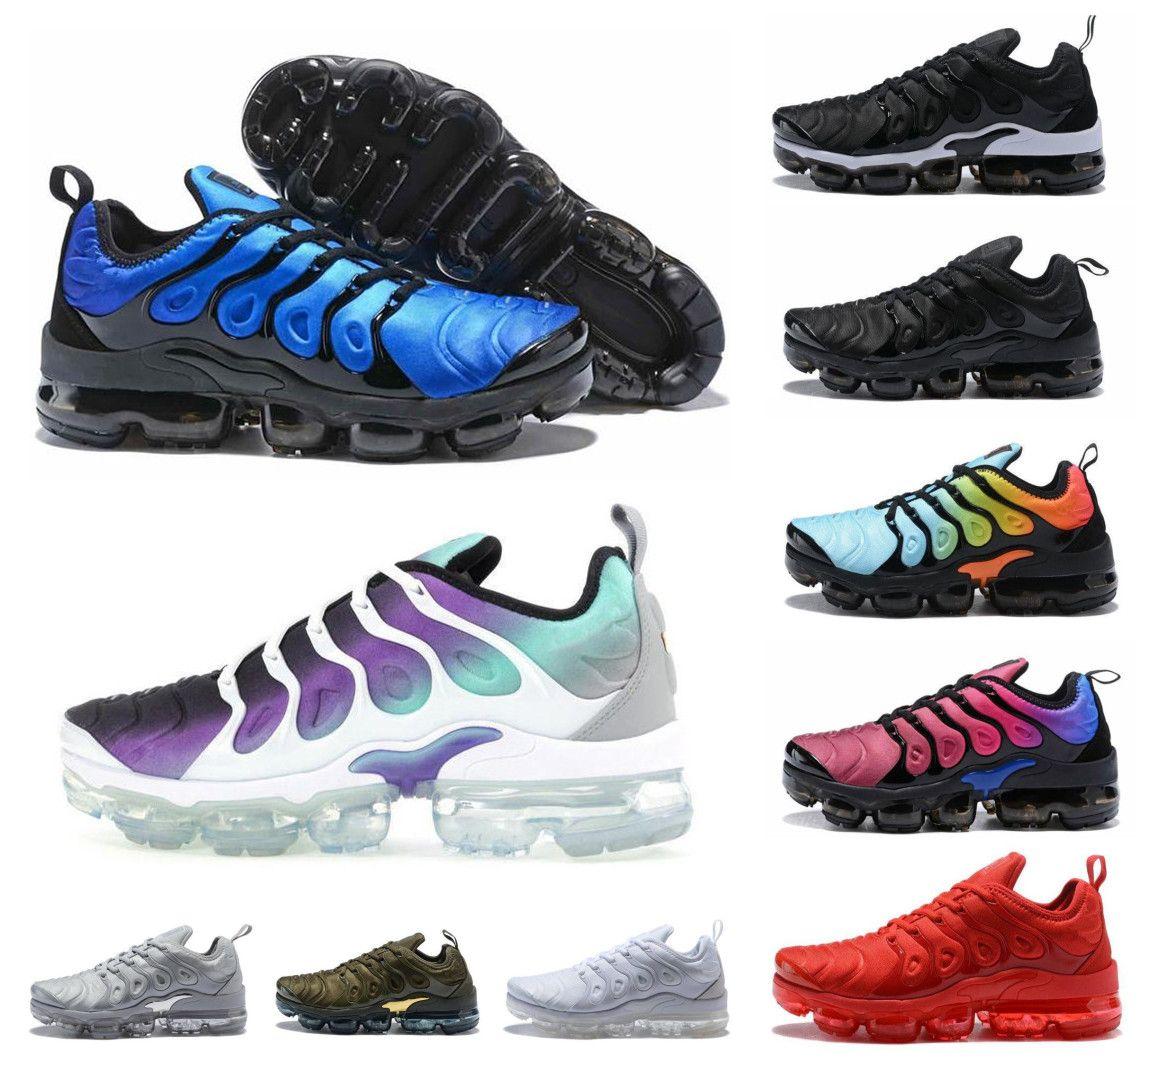 Nike Plus Running De Para Air Zapatillas Vapormax Max Hombre Tn f7b6yg